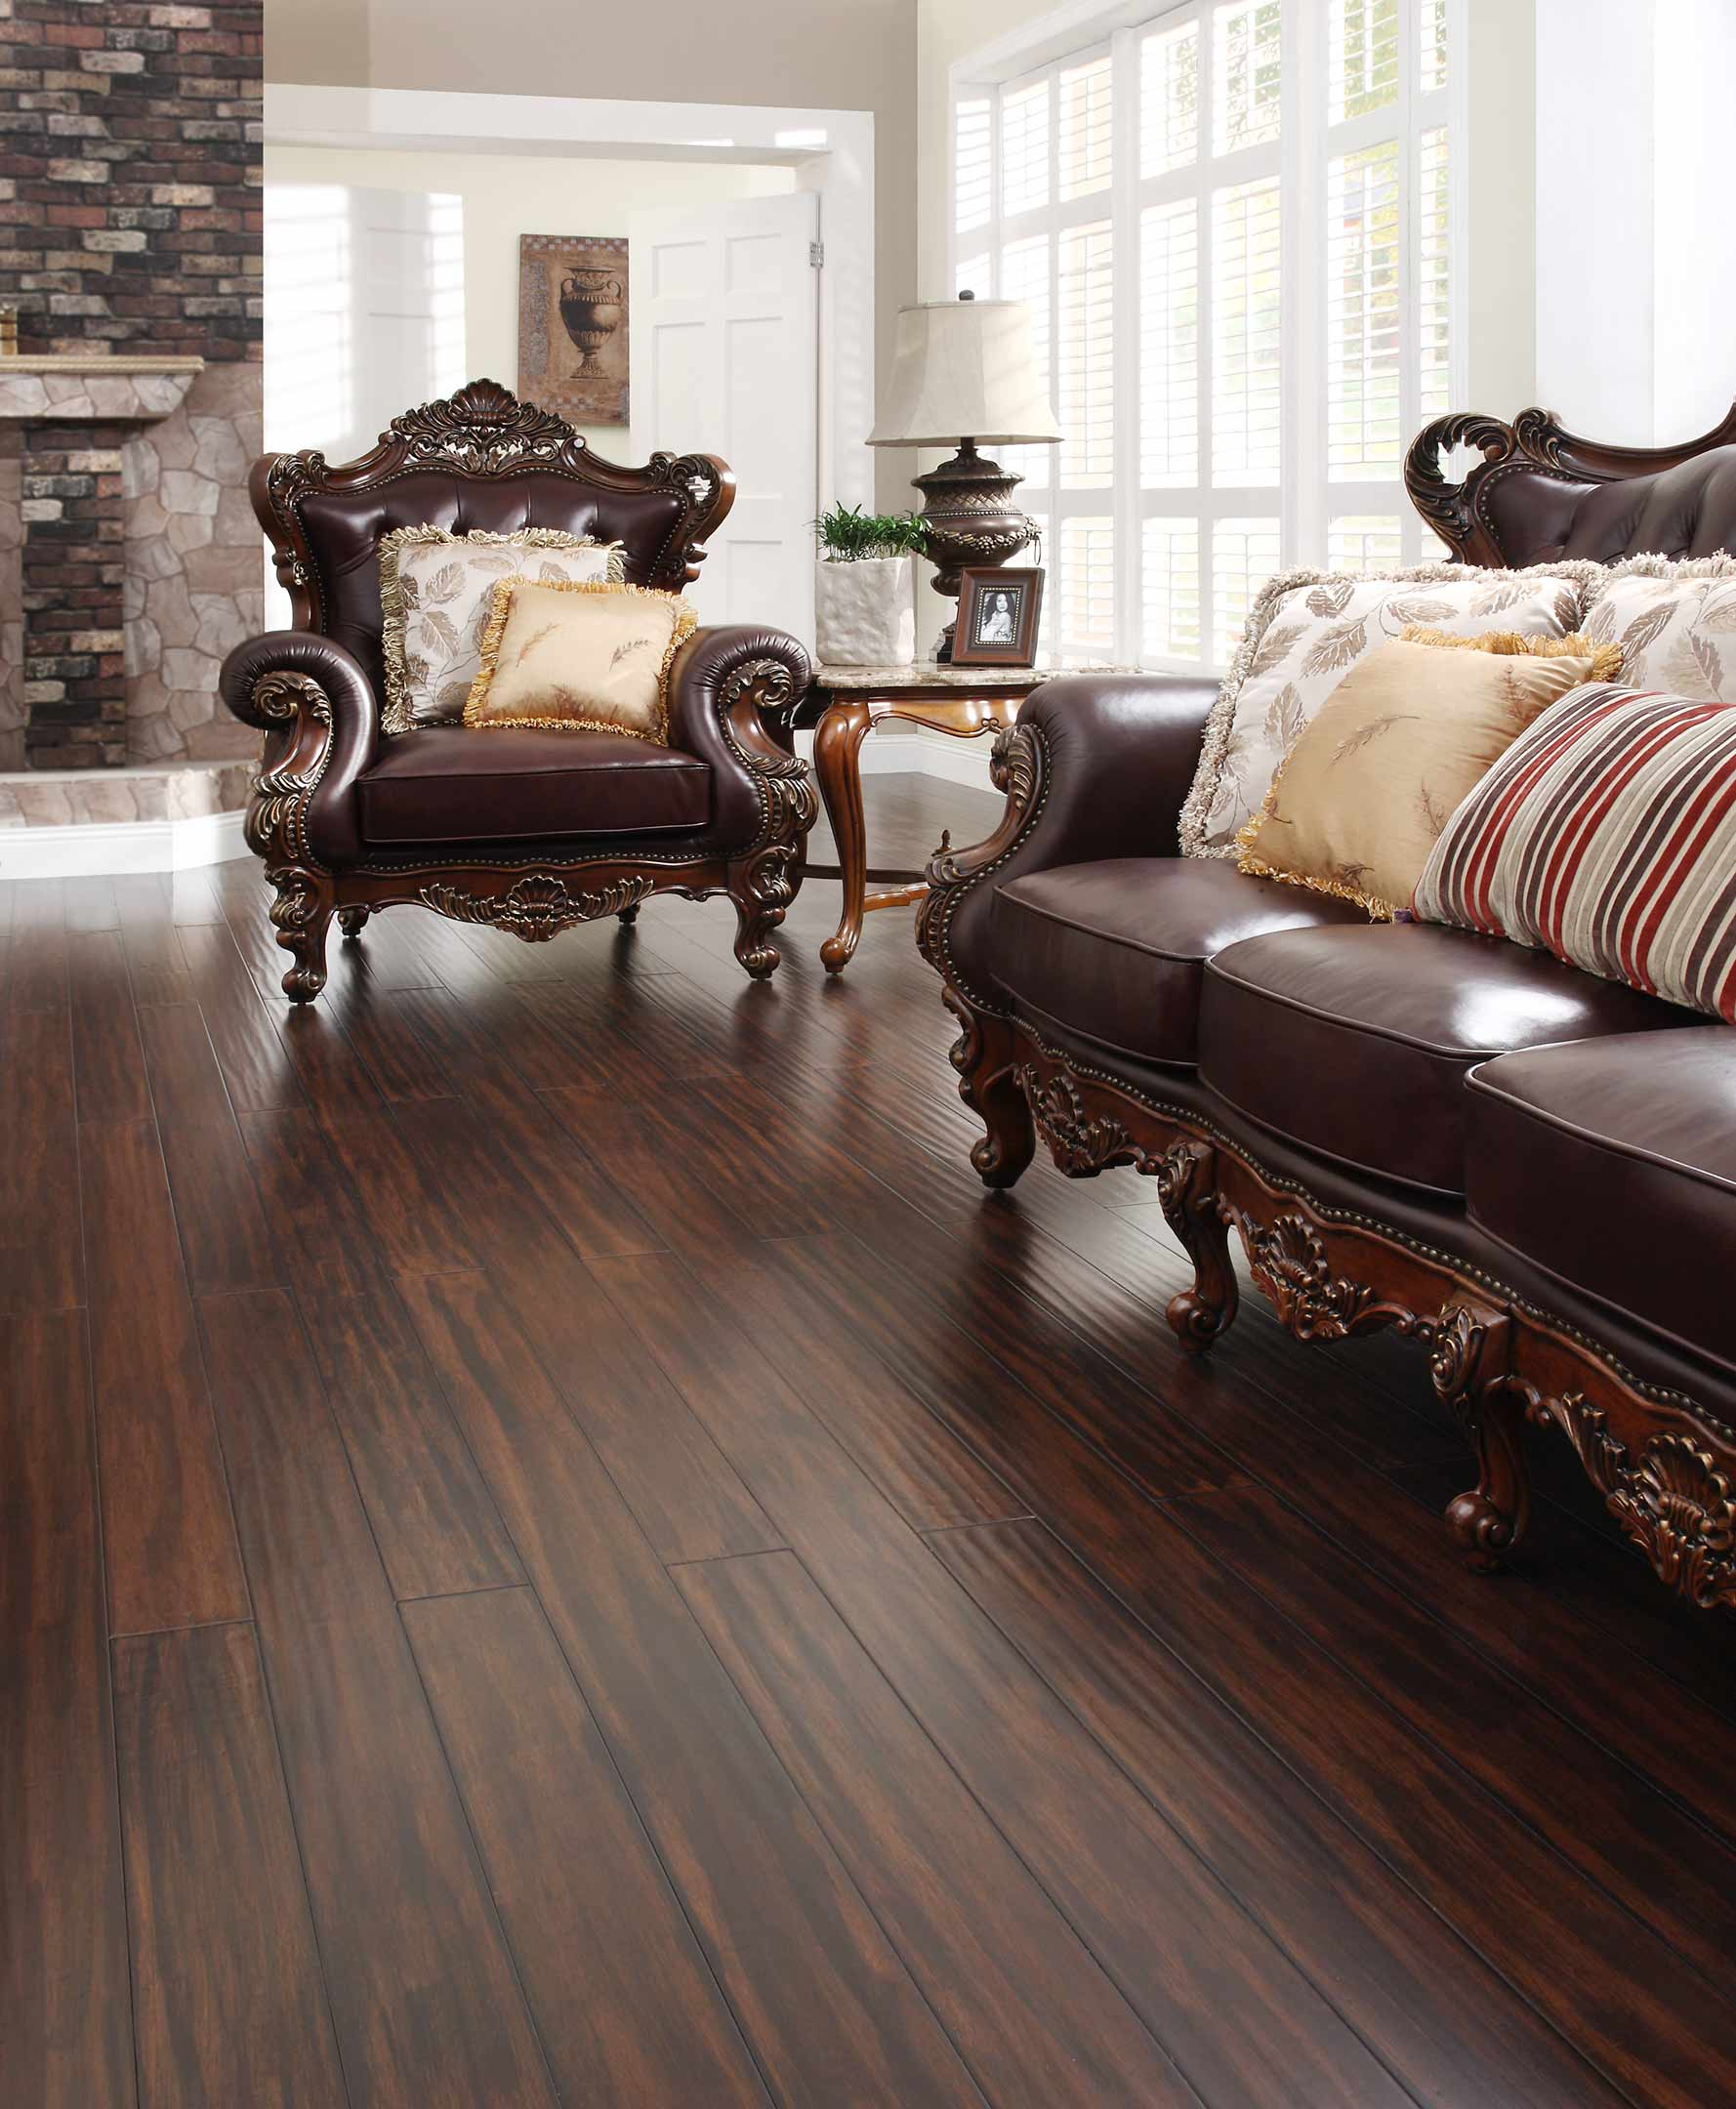 Flooring Hardwood Bamboo Tile Linoleum